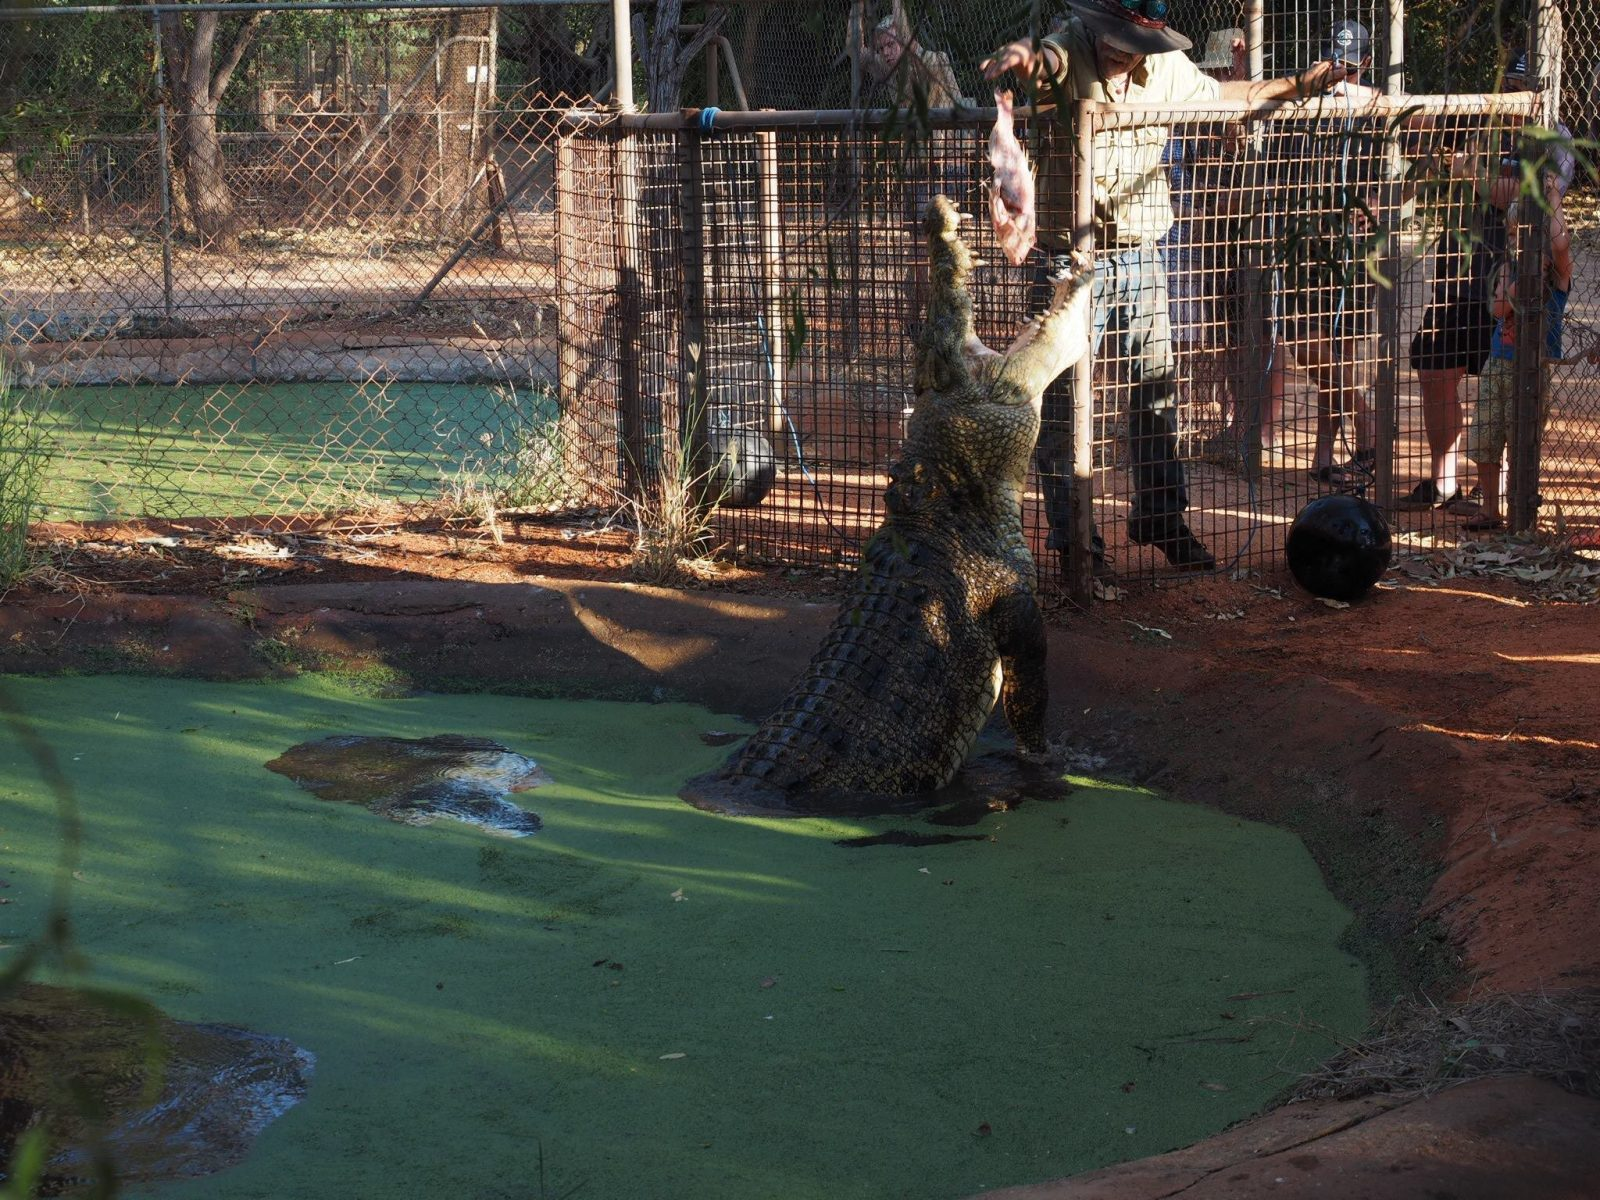 Malcolm Douglas Crocodile Park, Roebuck, Western Australia